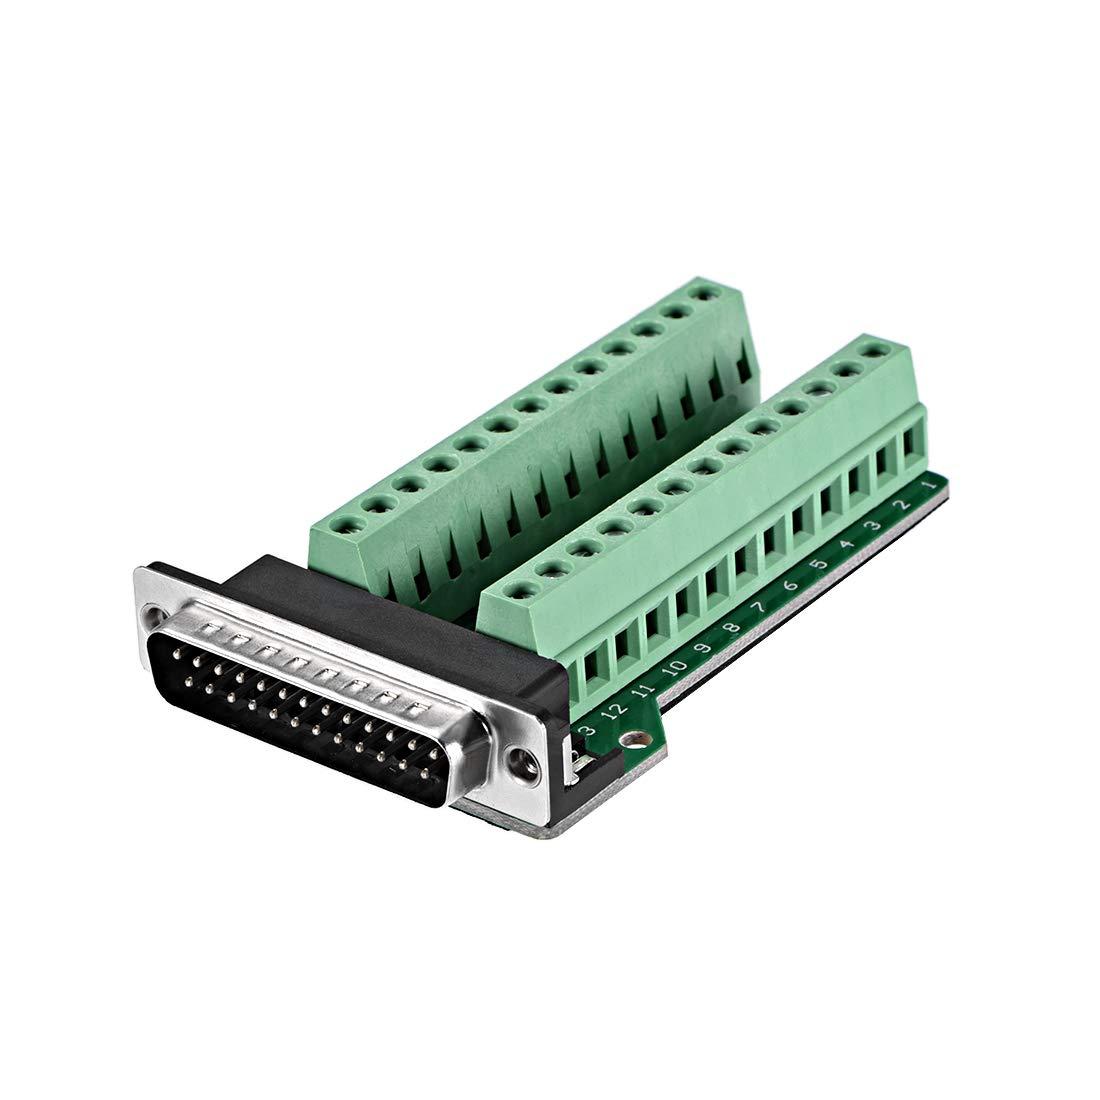 l/ötfreier Terminalblock-Adapter mit Positionierungsmuttern 2-reihiger Stecker 9-polig Sourcing Map D-sub DB9 Breakout-Board-Stecker